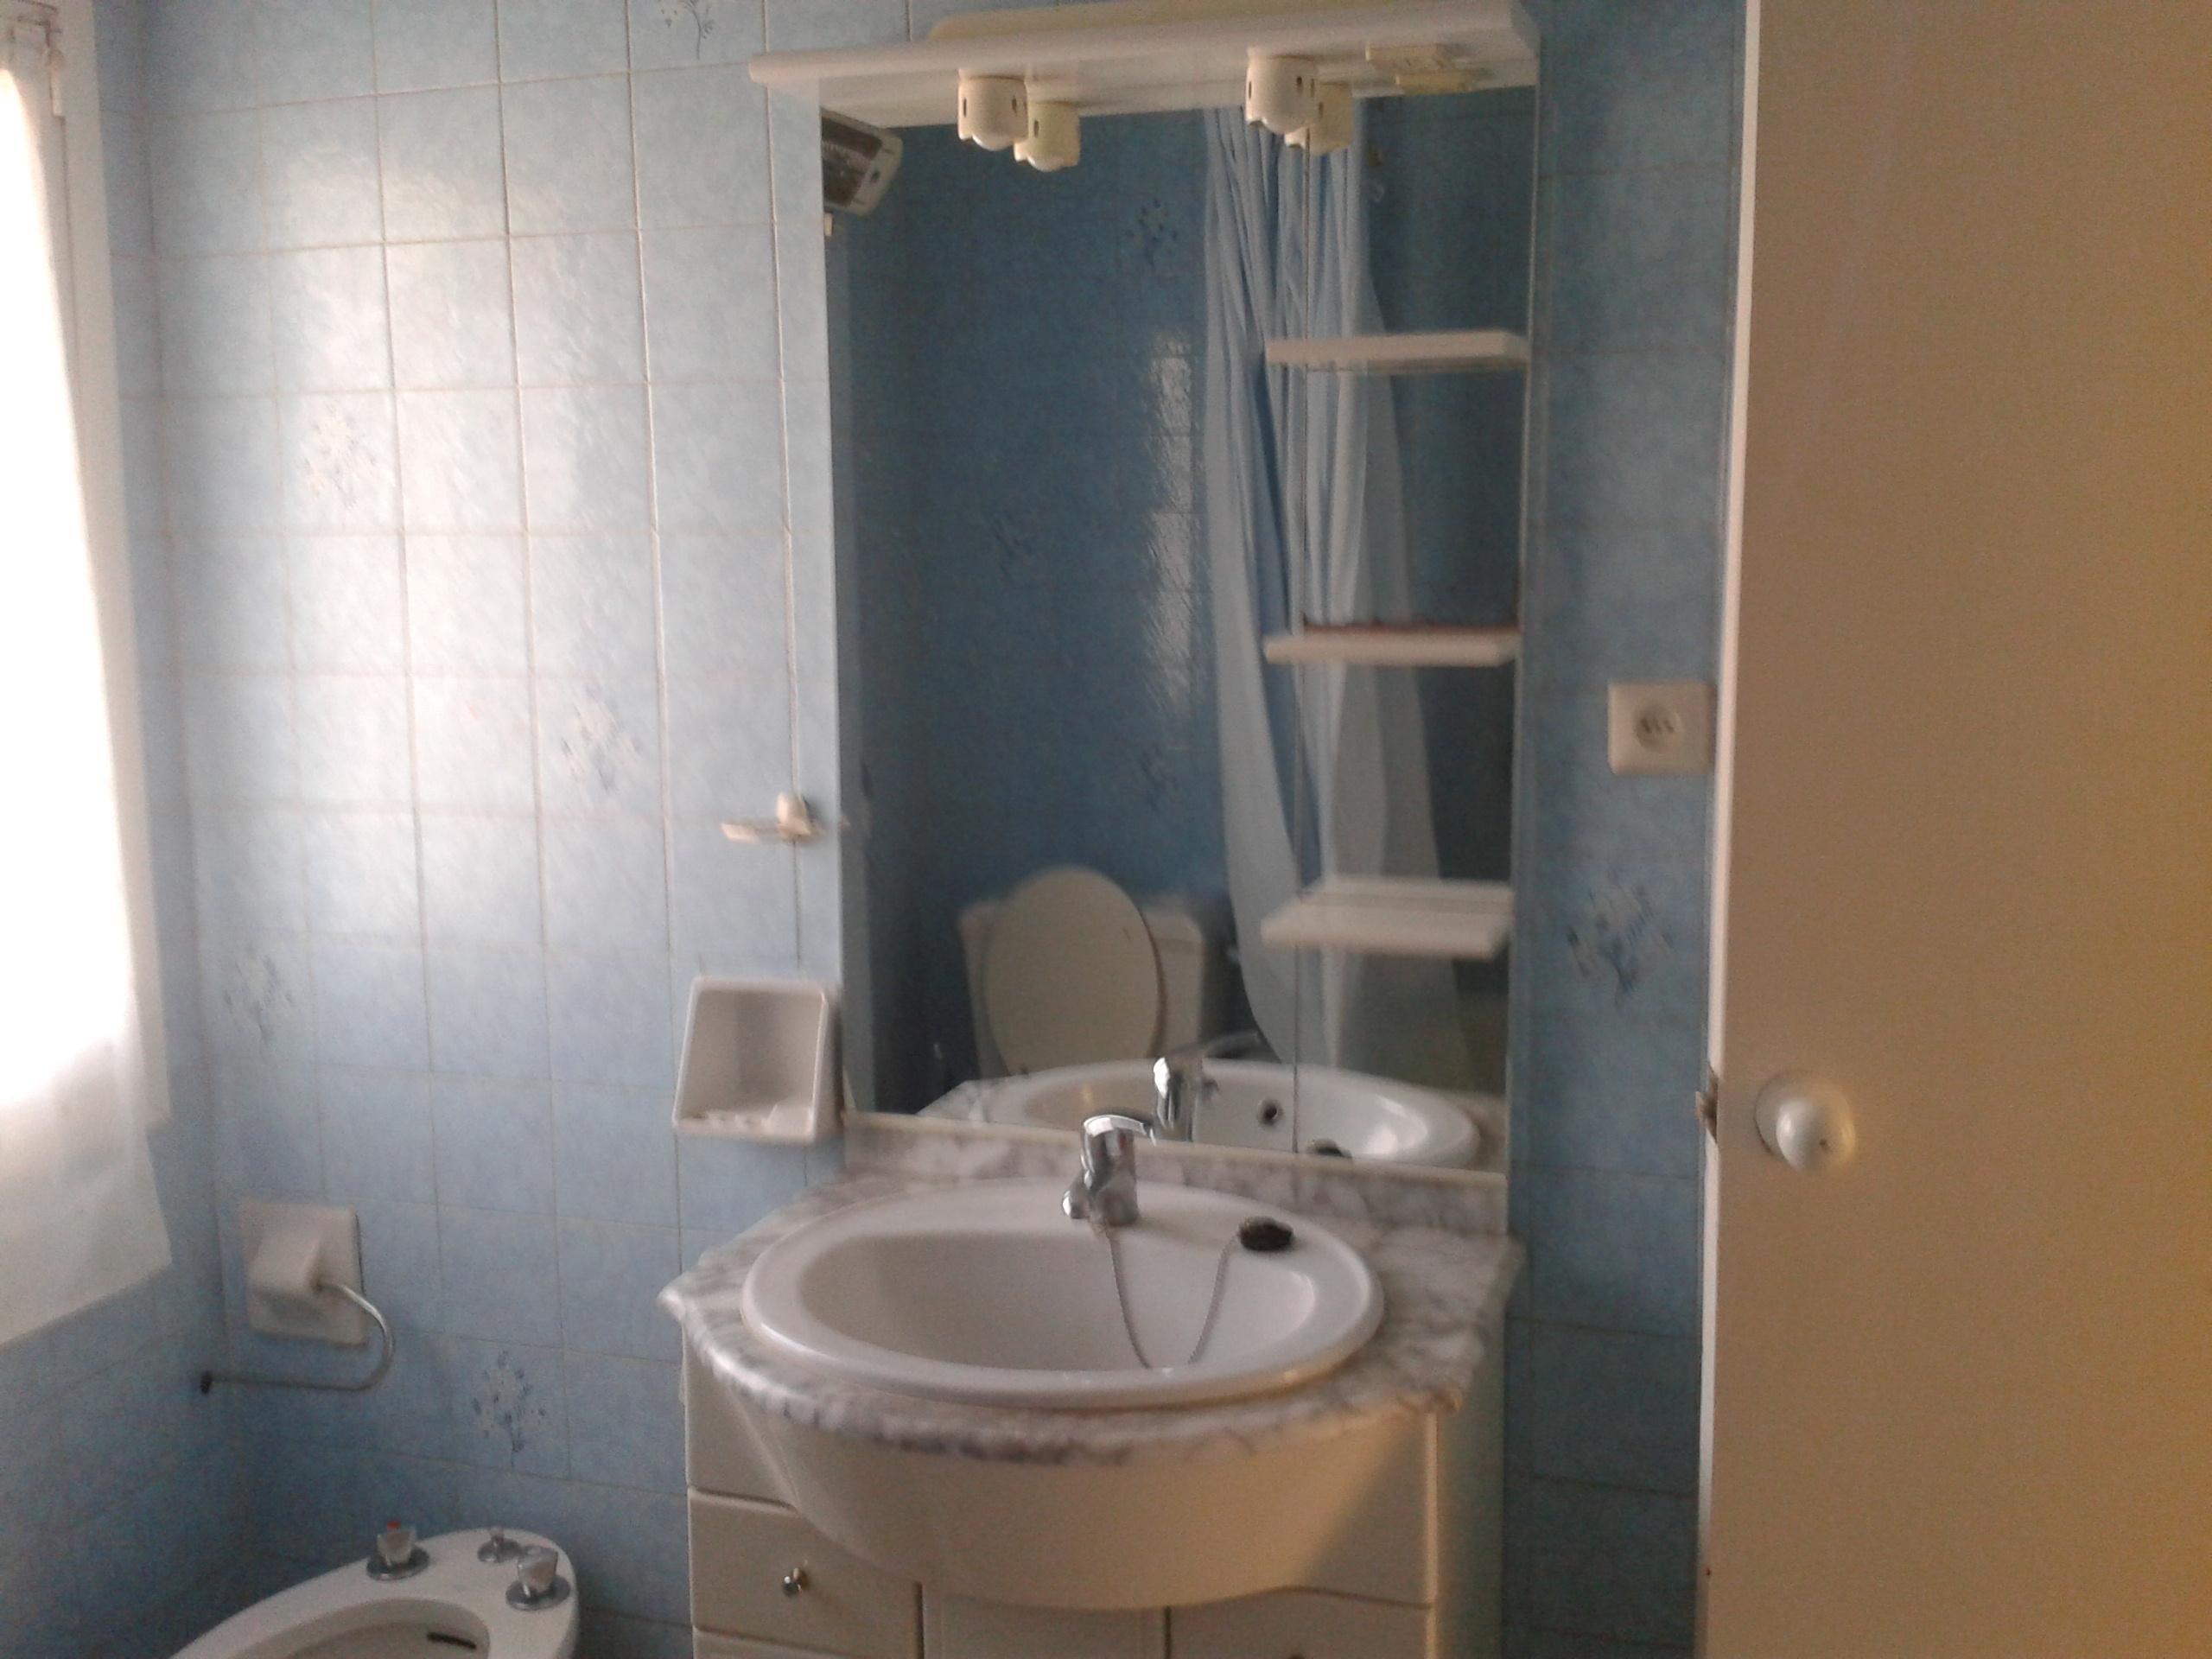 Bathroom before....